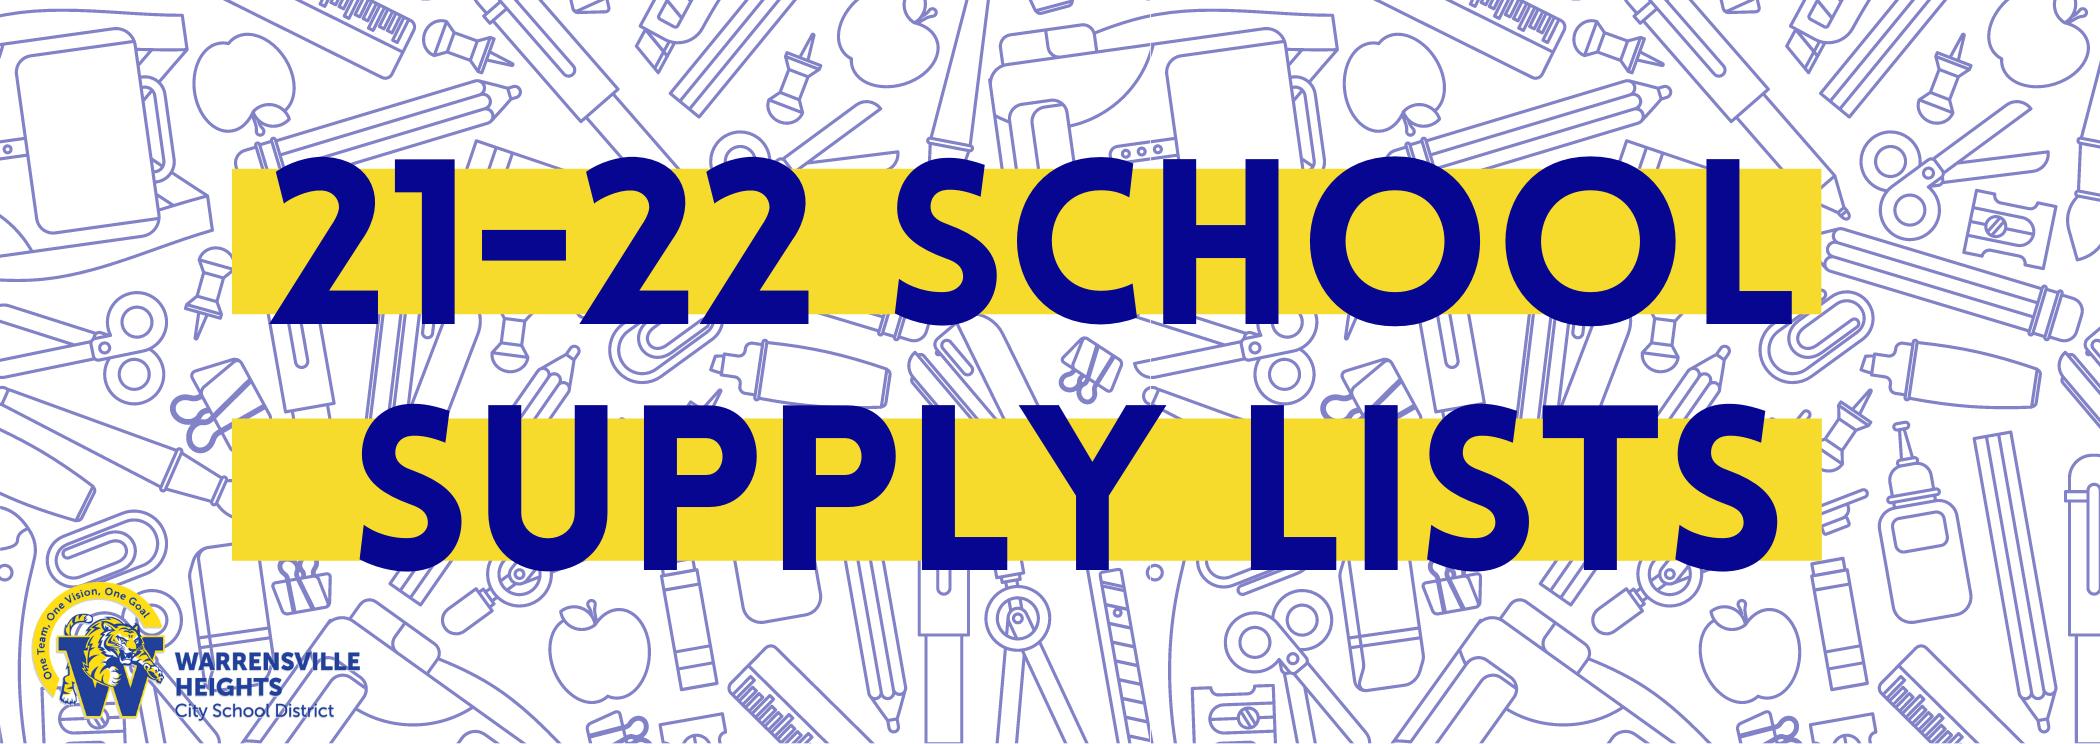 21 22 school supply list